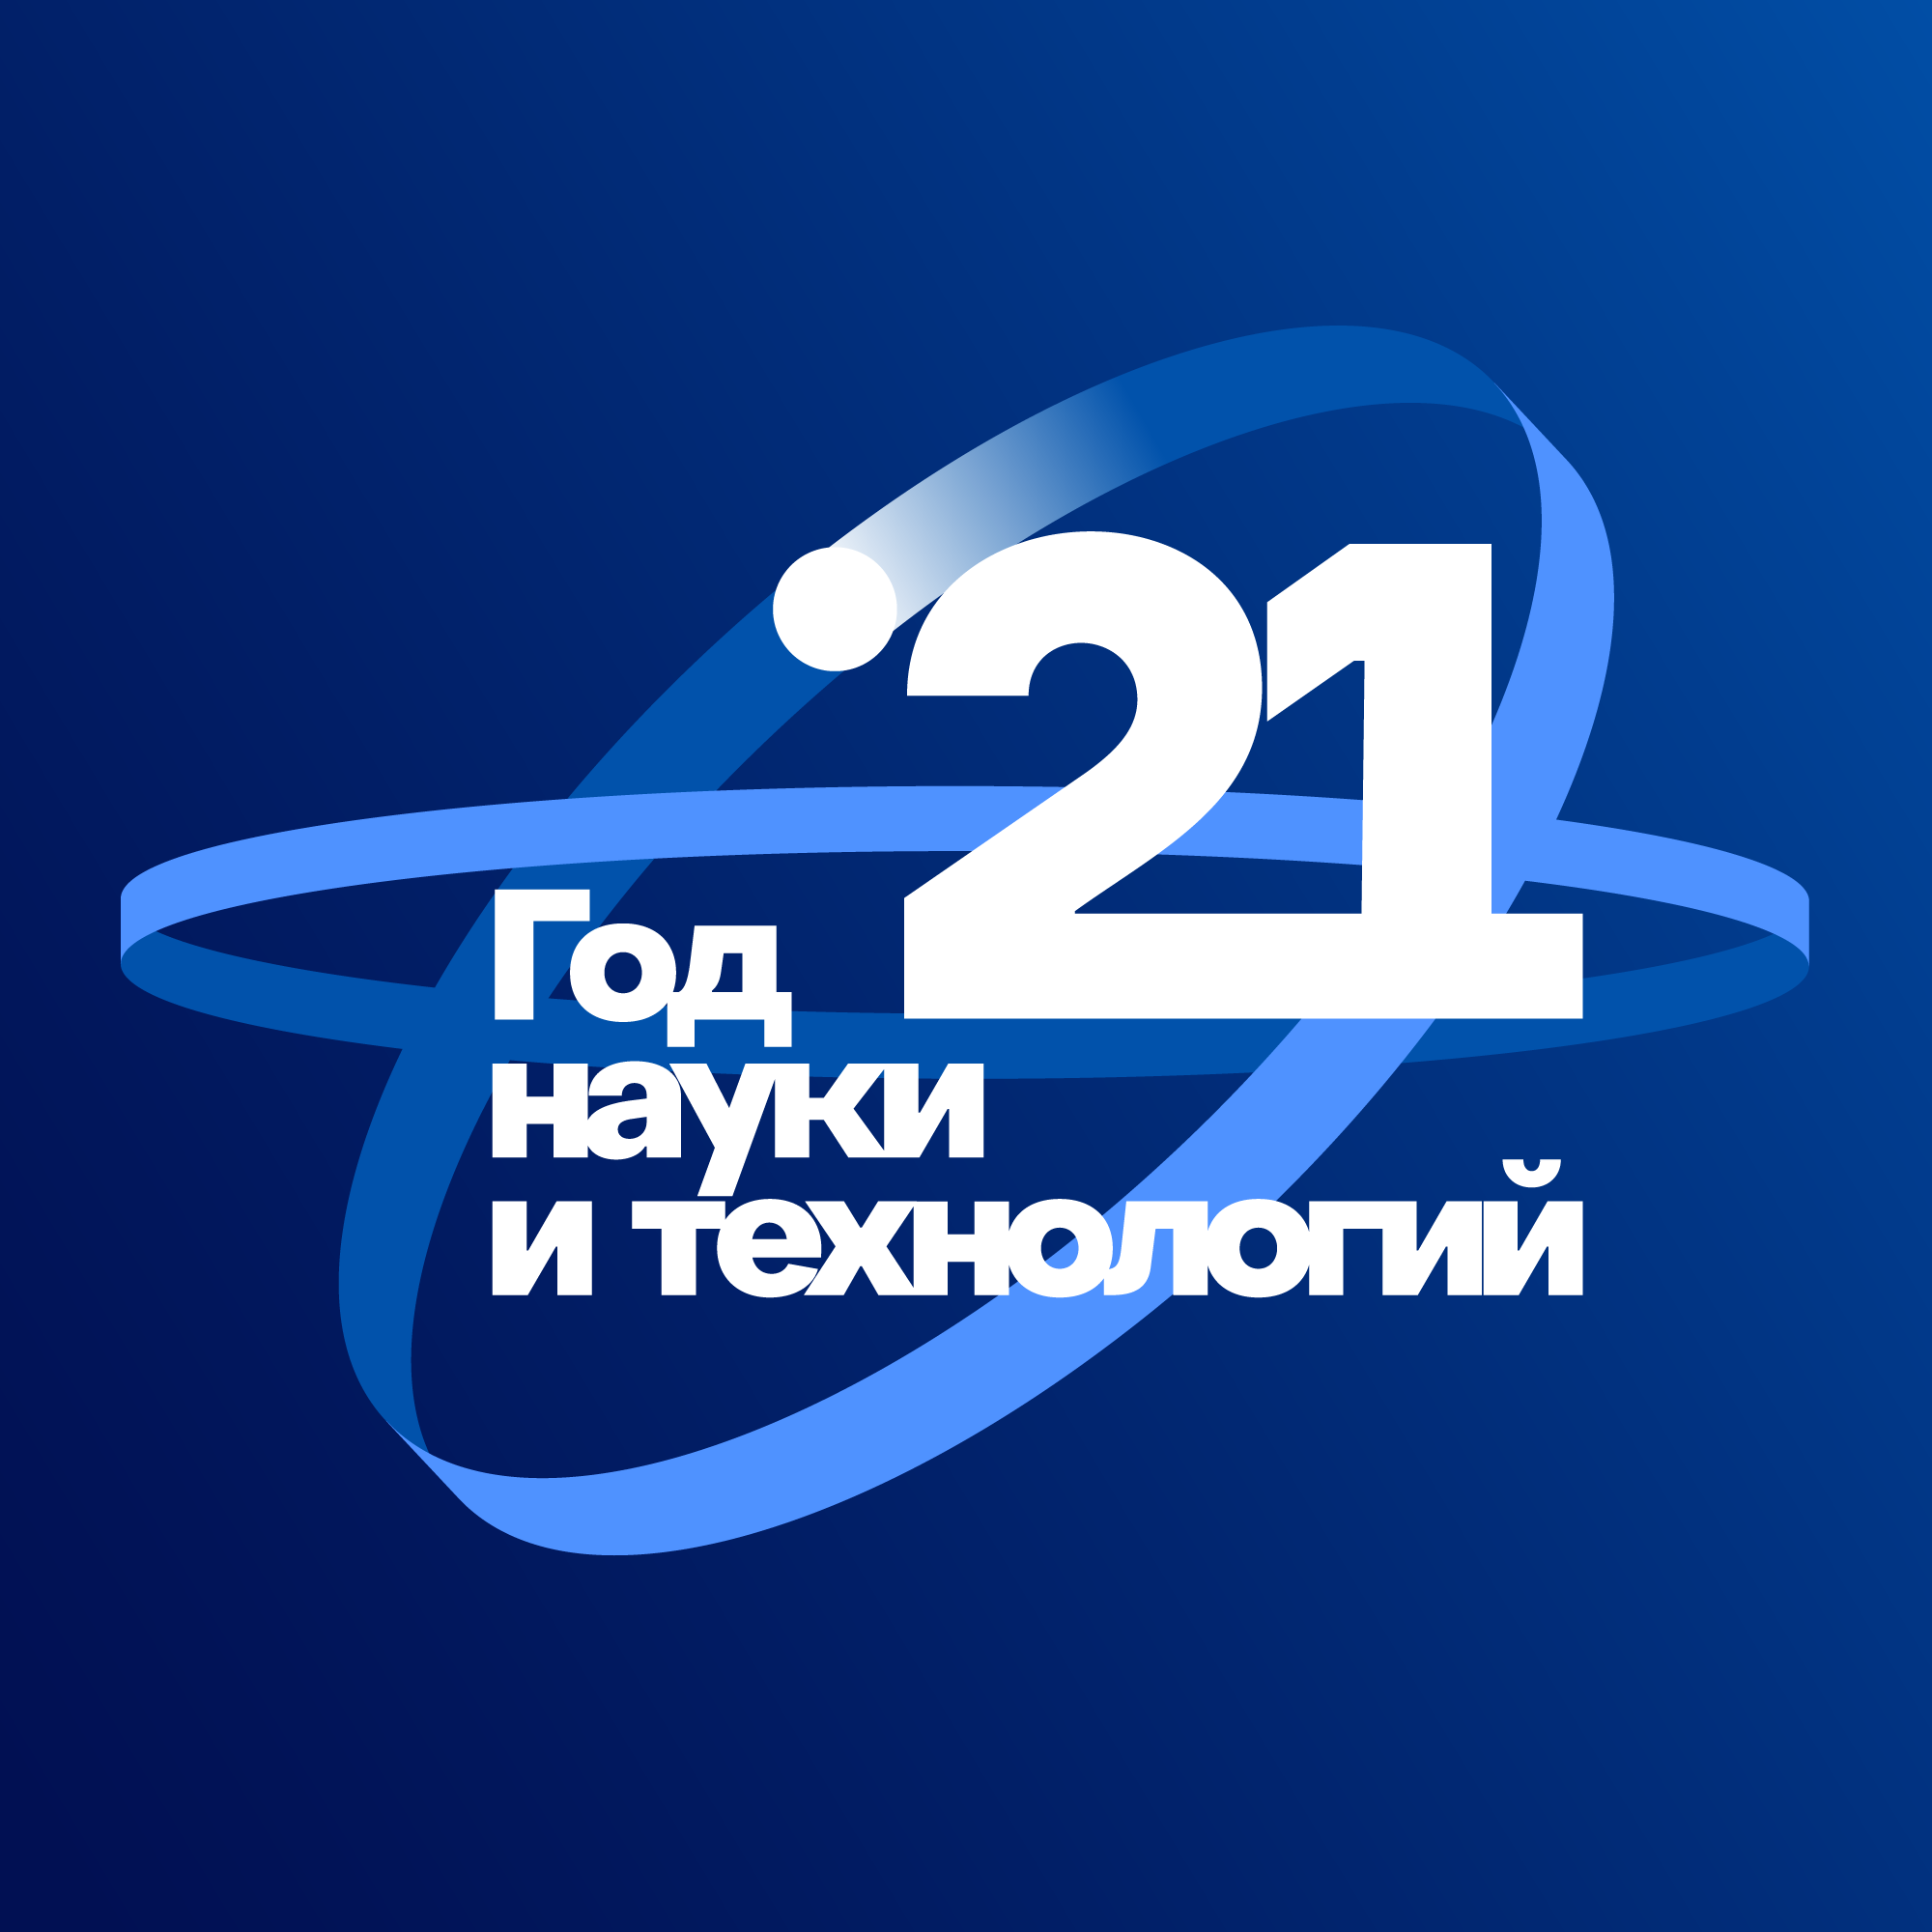 2021 – Год науки и технологий